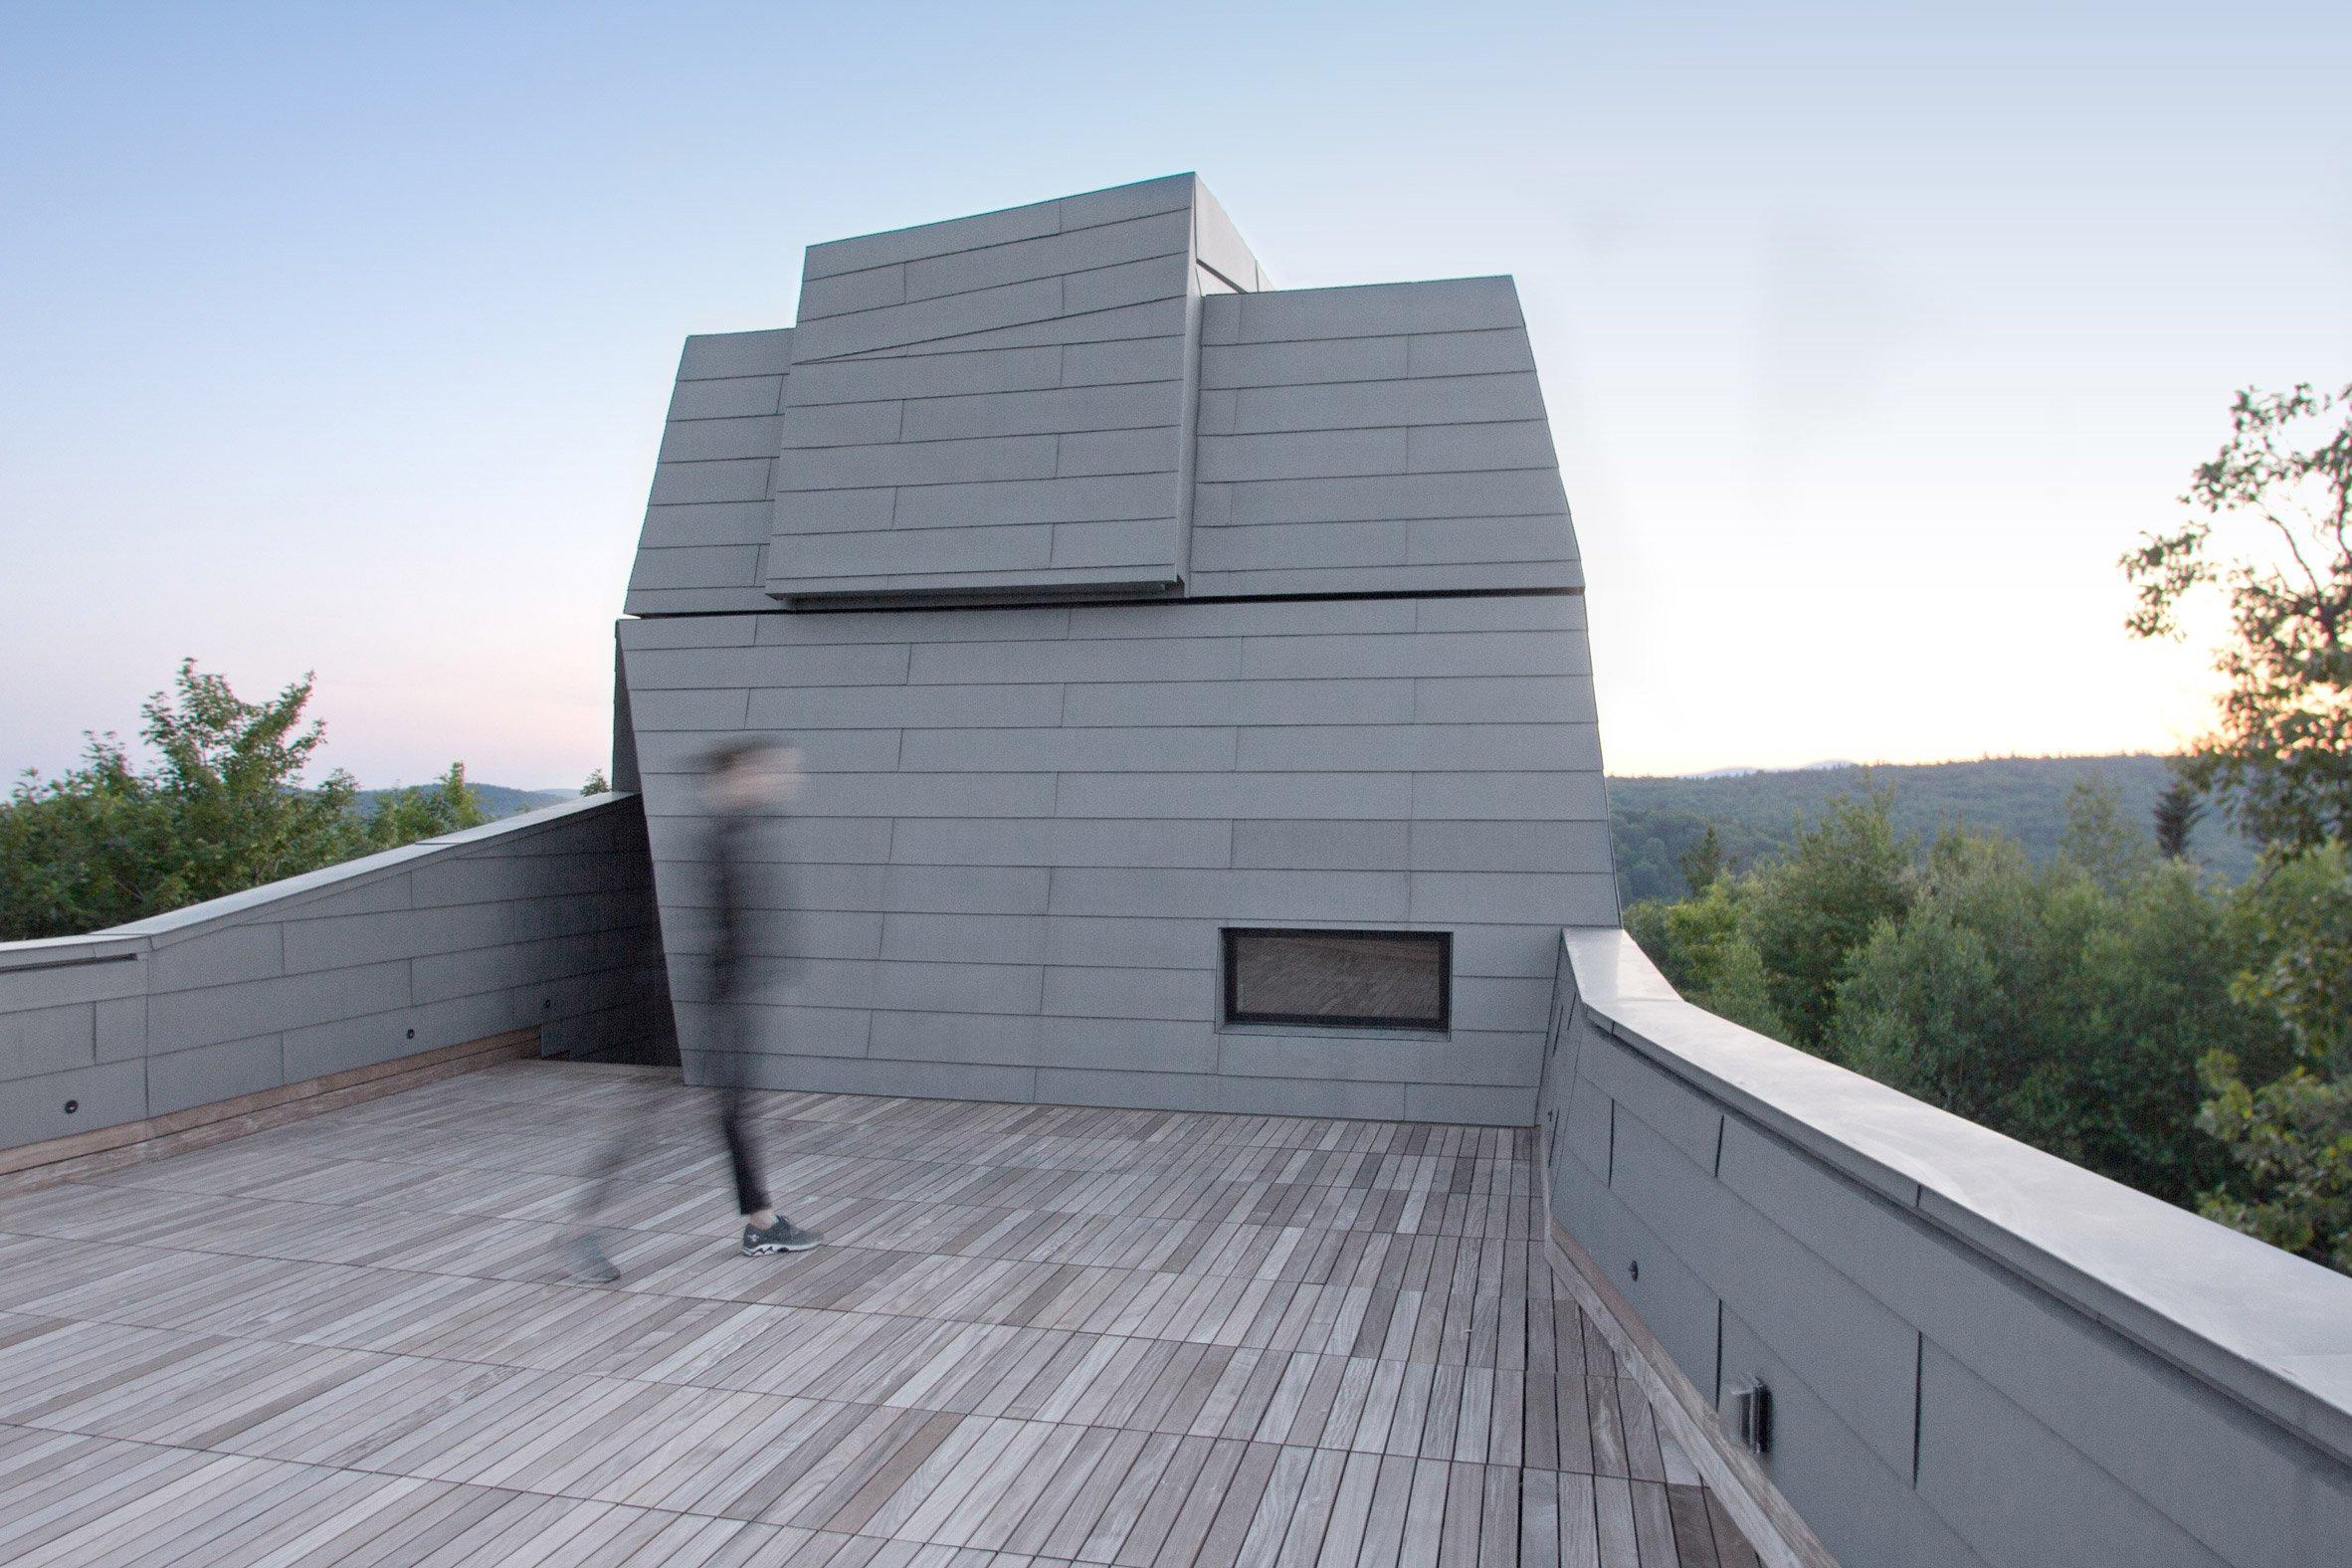 gemma-observatory-anmahian-winton-architects_dezeen_2364_col_4.jpg